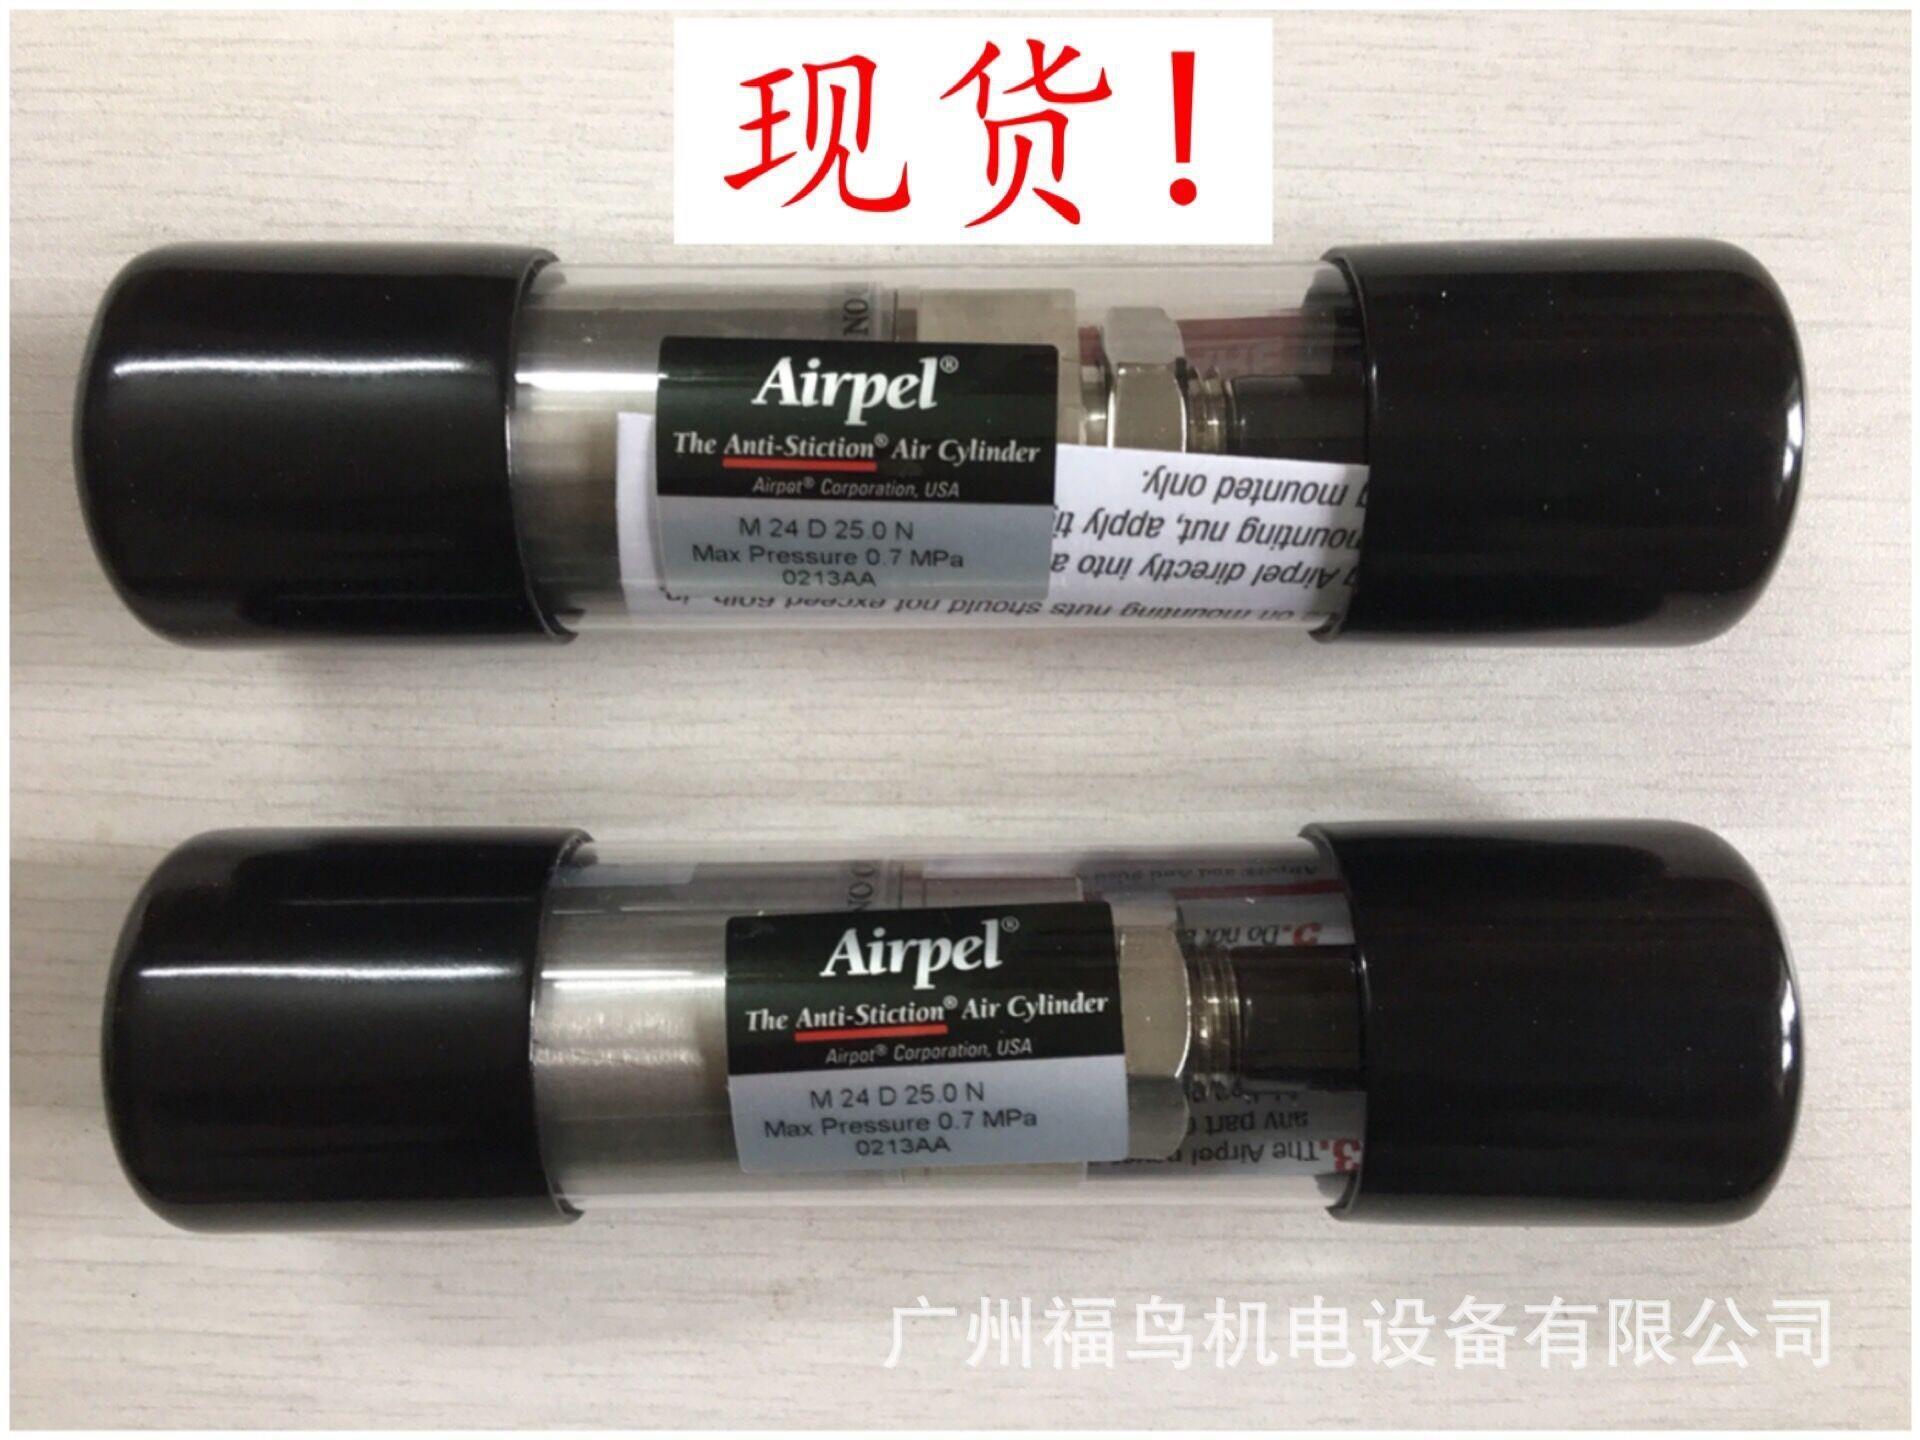 AIRPEL / AIRPOT玻璃氣缸, 現貨型號: M24D25.0N